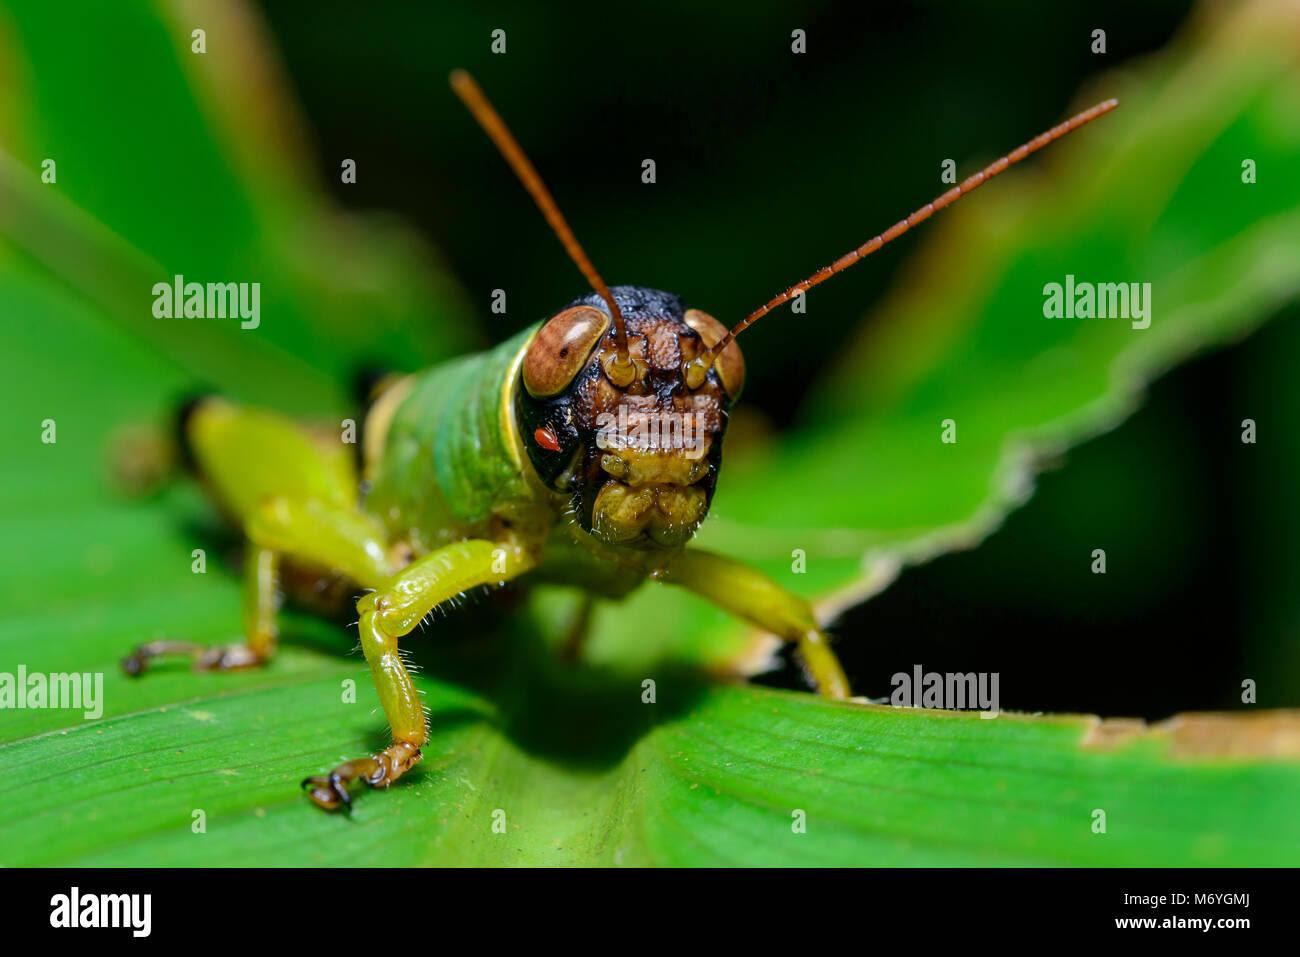 Green Grasshopper,Orthoptera (Order),Caelifera (Suborder),Costa Rica,Carara Nationa Park - Stock Image